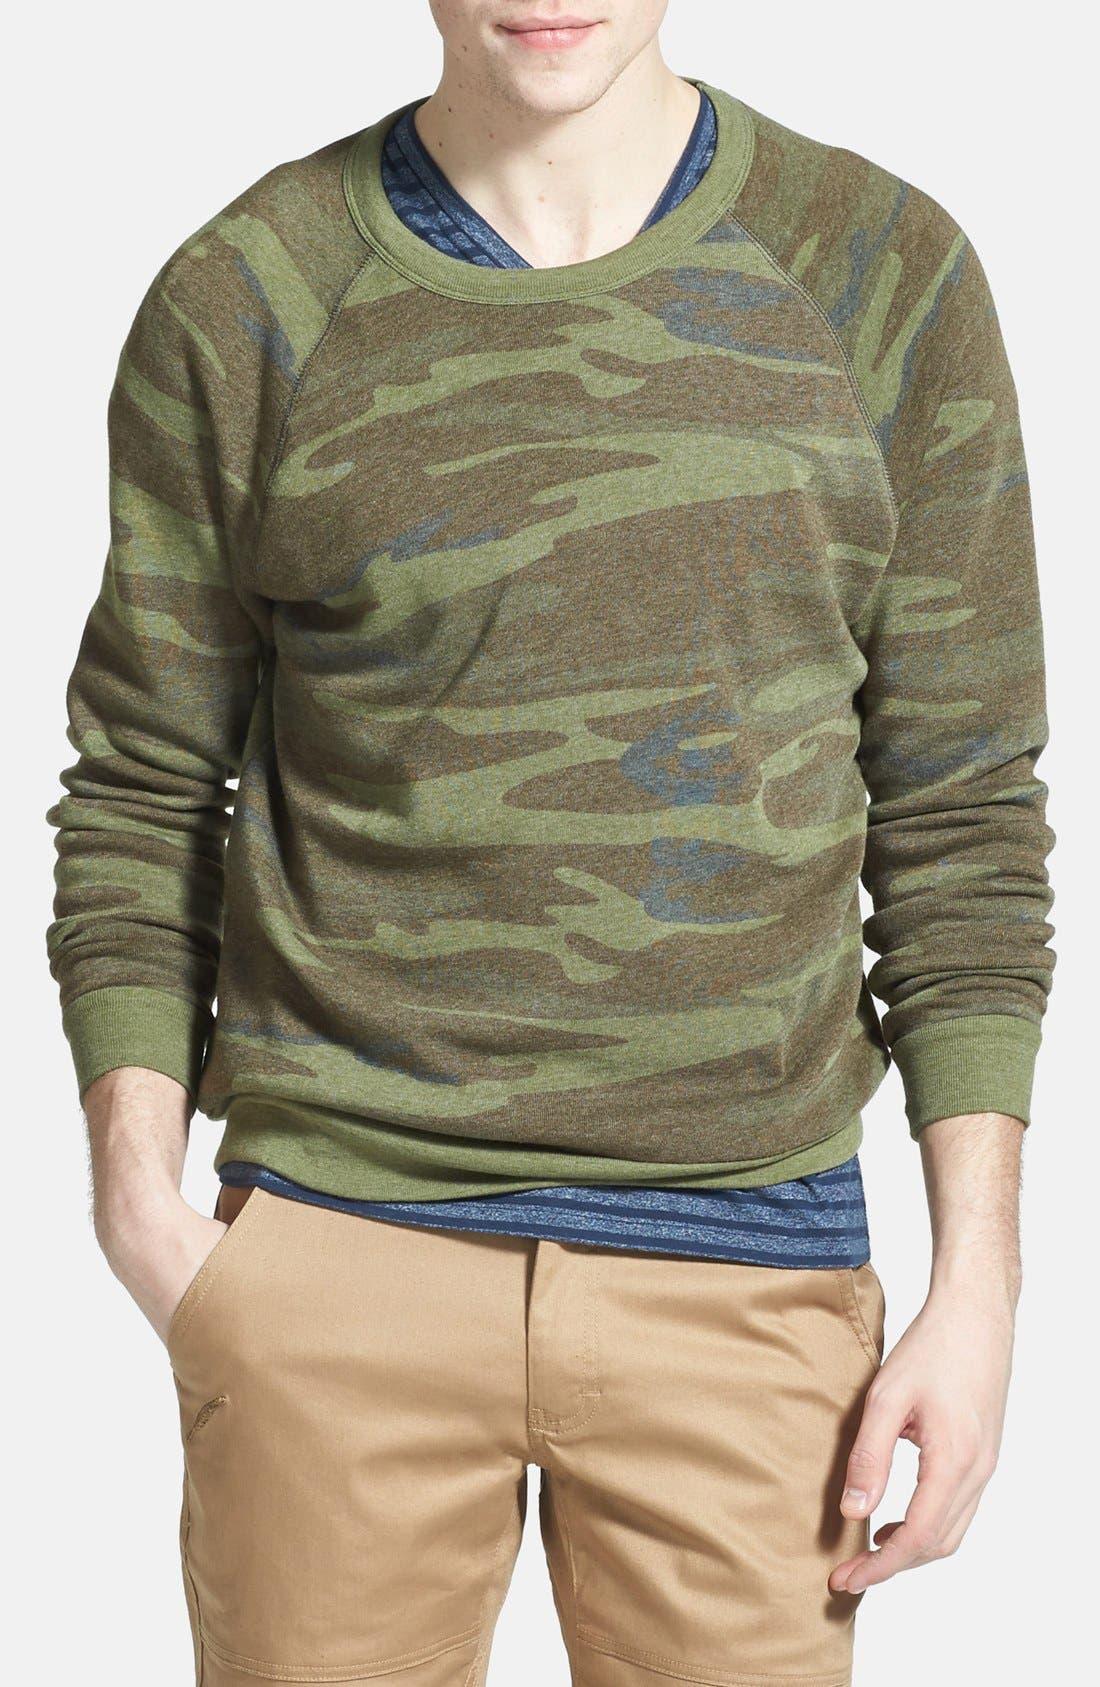 Alternative 'The Champ' Camo Print Crewneck Sweatshirt